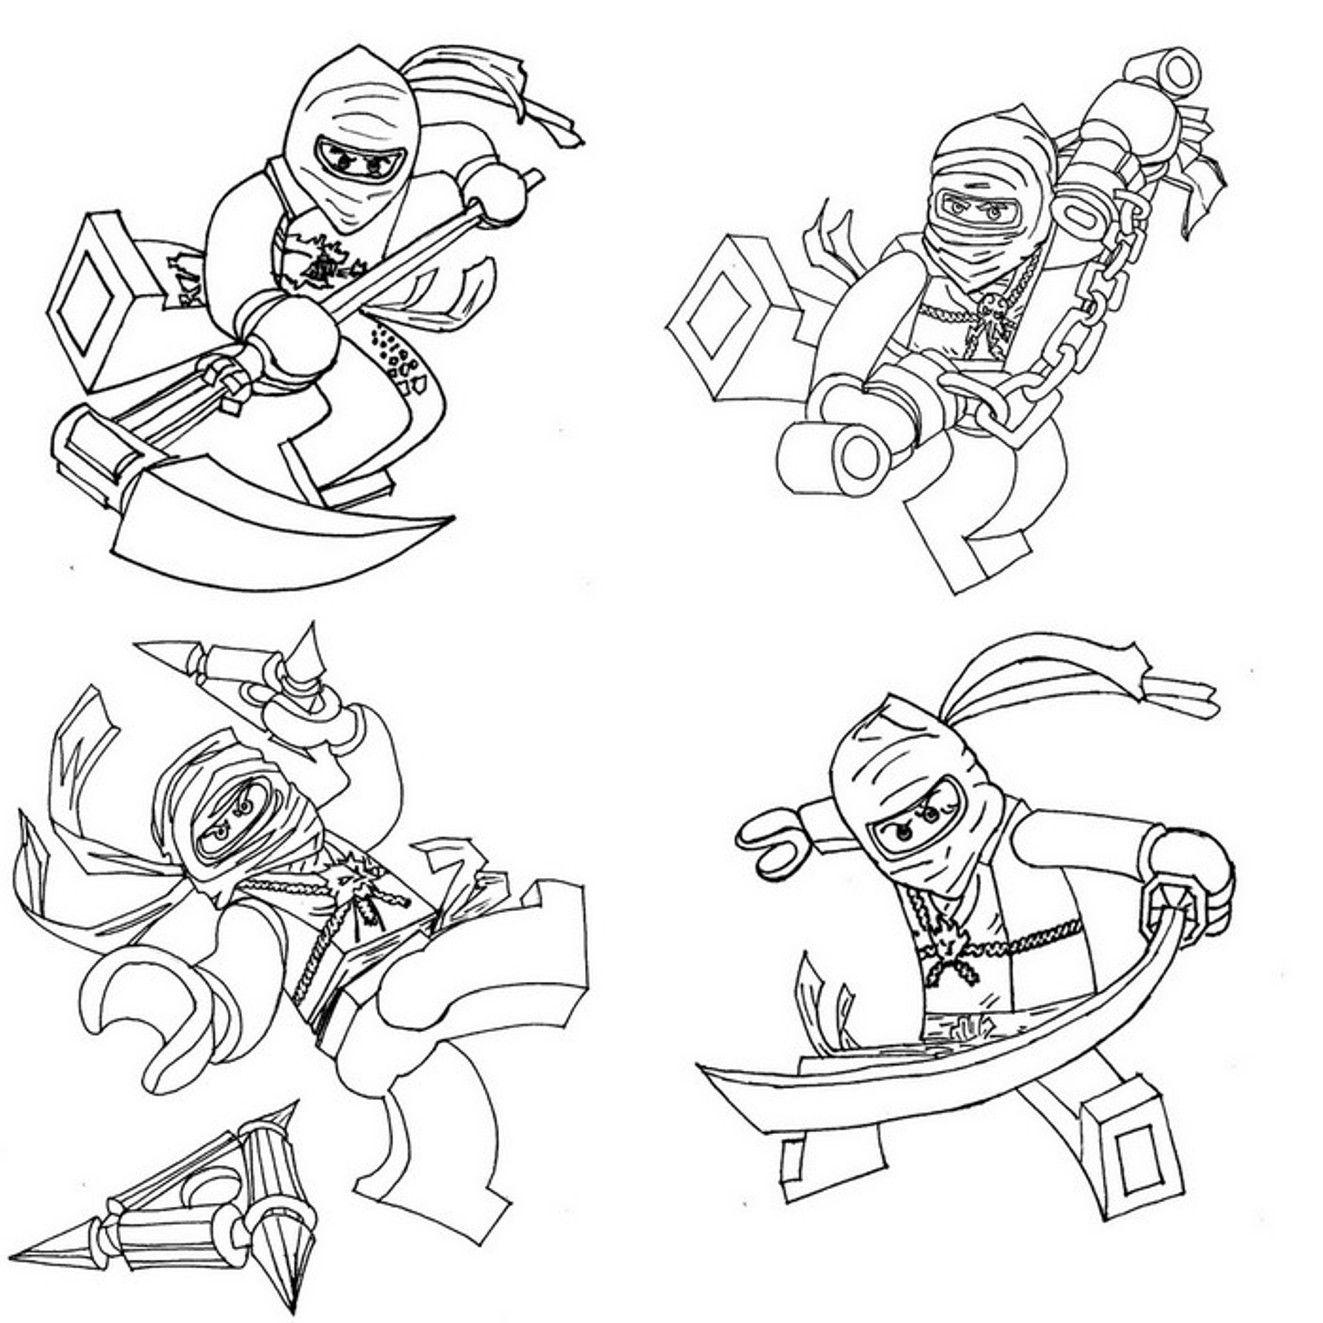 Ninjago coloring pages free printable goodness, ninjago coloring pages